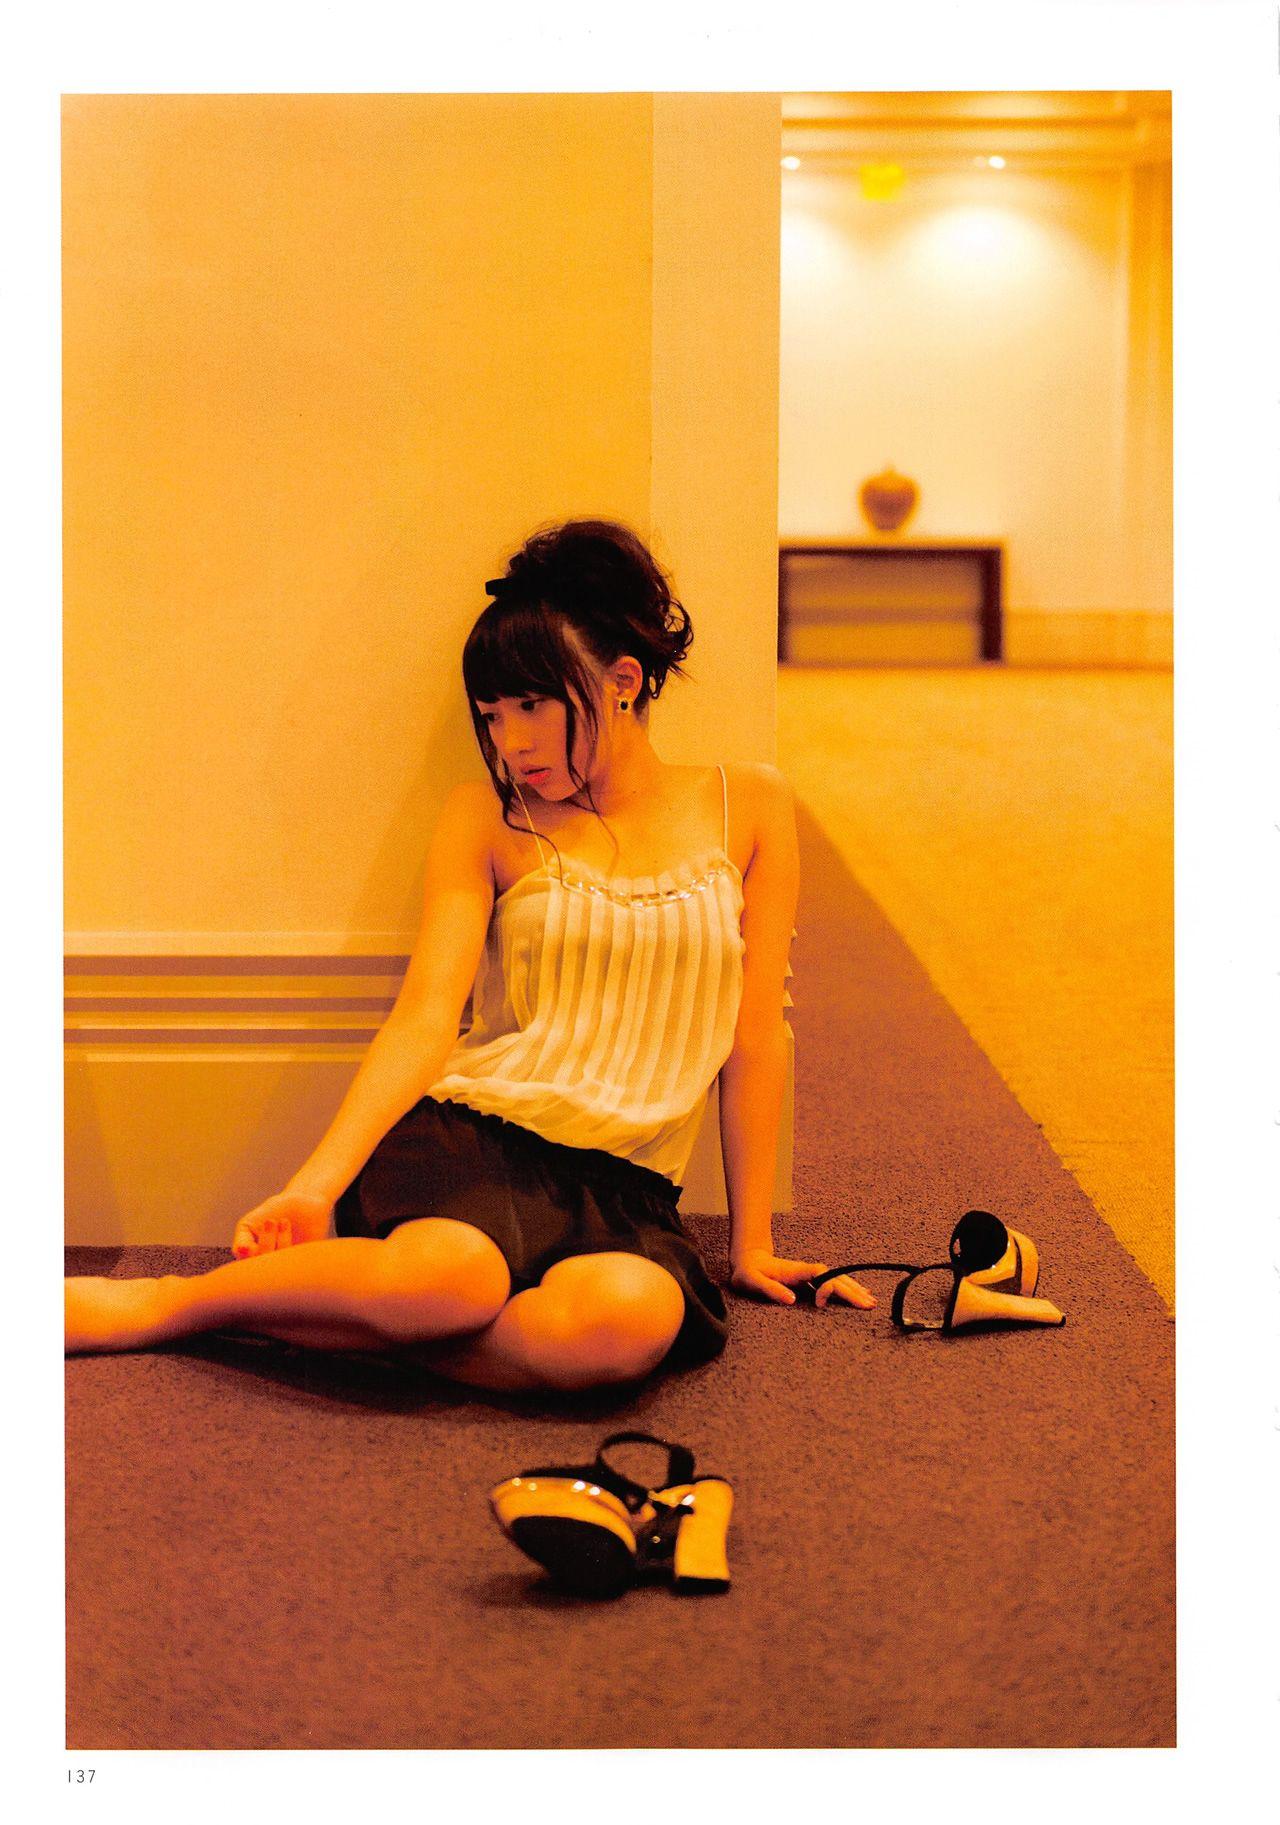 Kizaki Yuria (木﨑ゆりあ) - #Team 4 #AKB48 #japan #idol #Yuria #jpop #bikini #gravure #Photobook #masterpiece